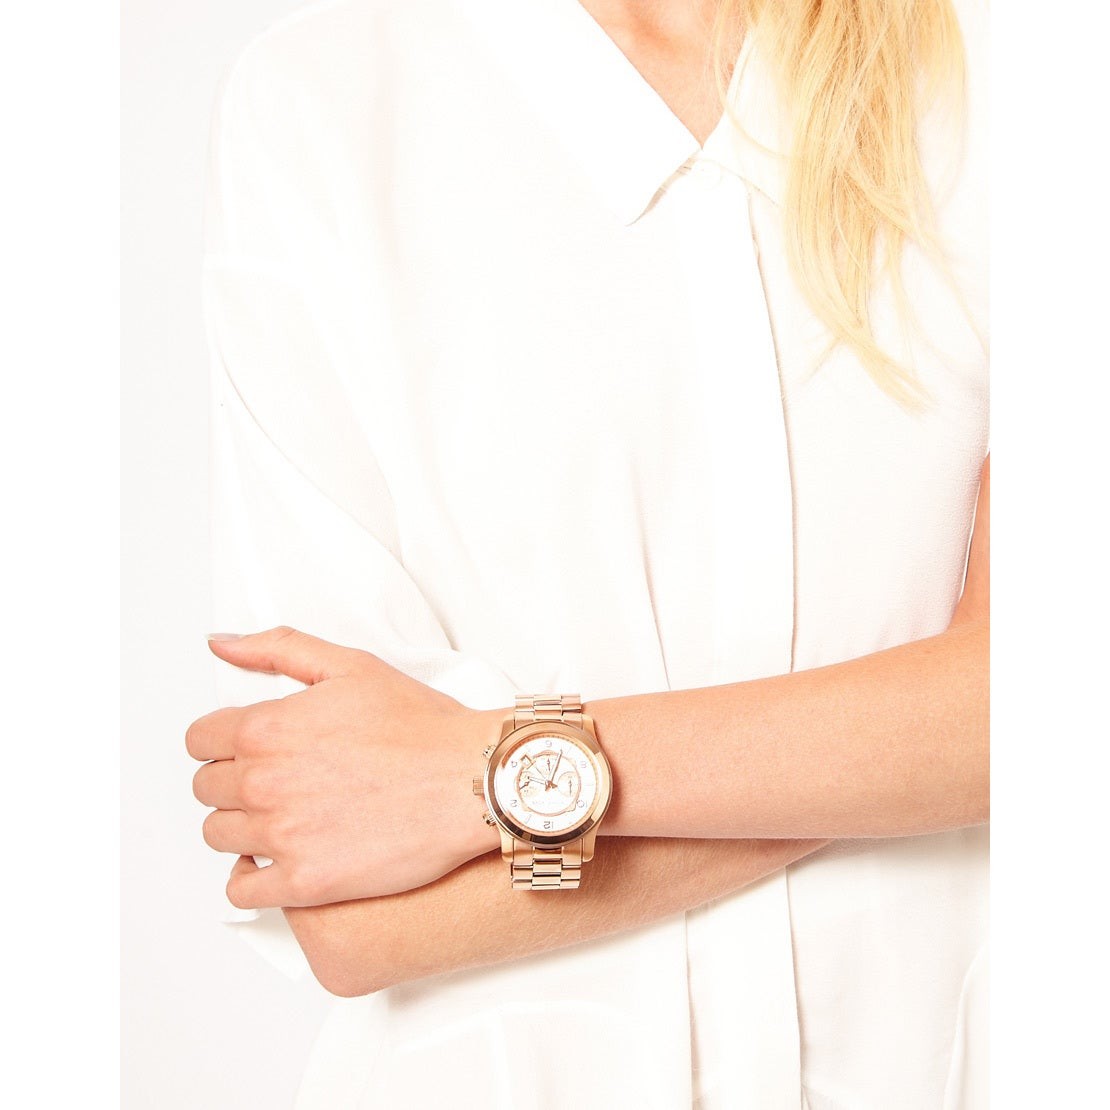 d4953c276e03 Shop Michael Kors Men s MK8096  Runway  Rose Gold-Tone Watch - Gold - Free  Shipping Today - Overstock - 5716192